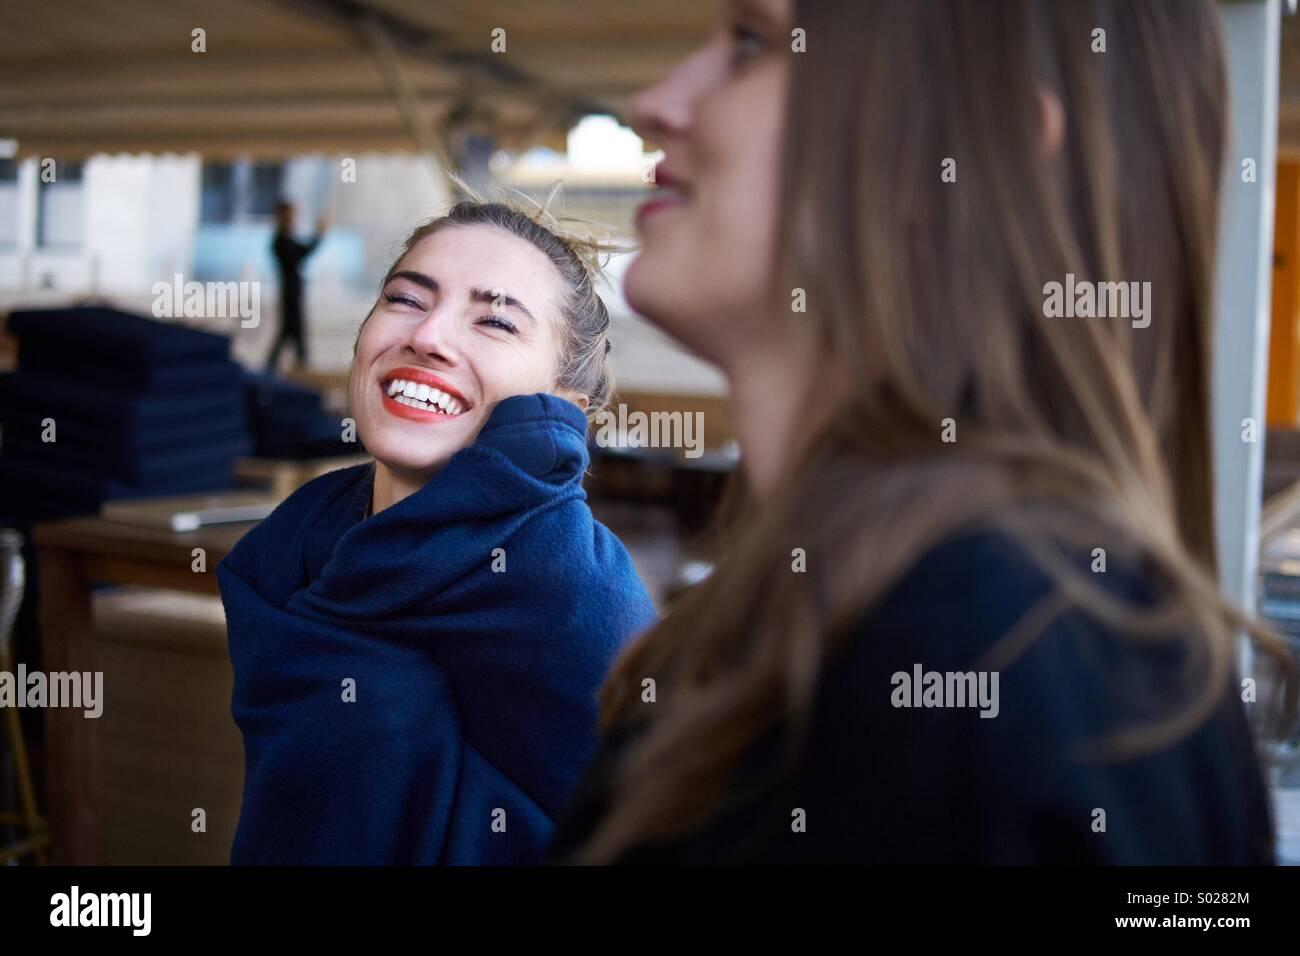 Two beautiful women enjoy the moment - Stock Image